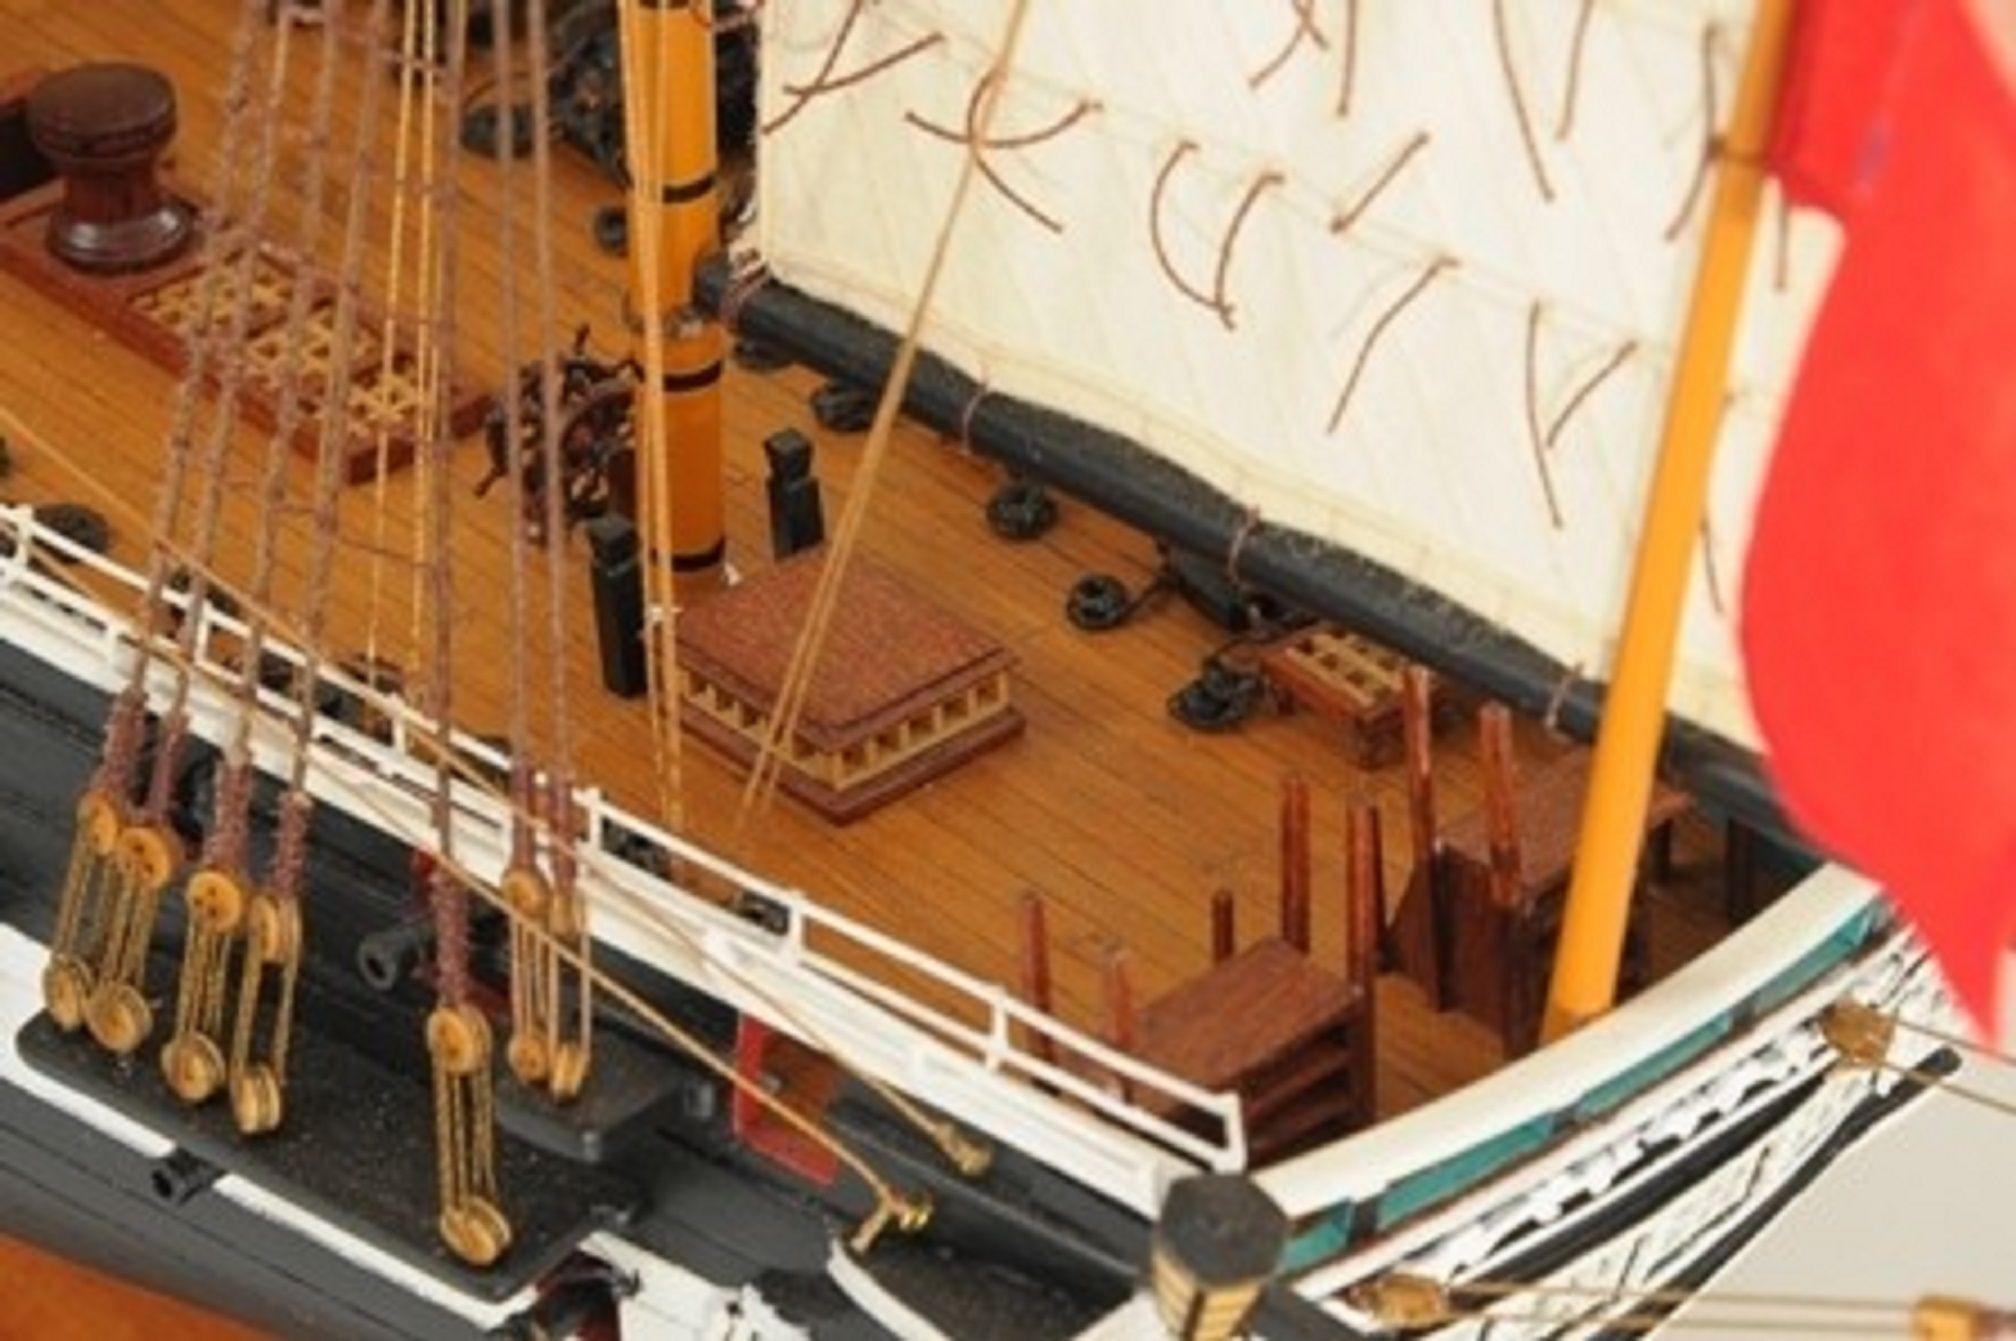 1059-7416-HMS-Trincomalee-Ship-Model-Premier-Range